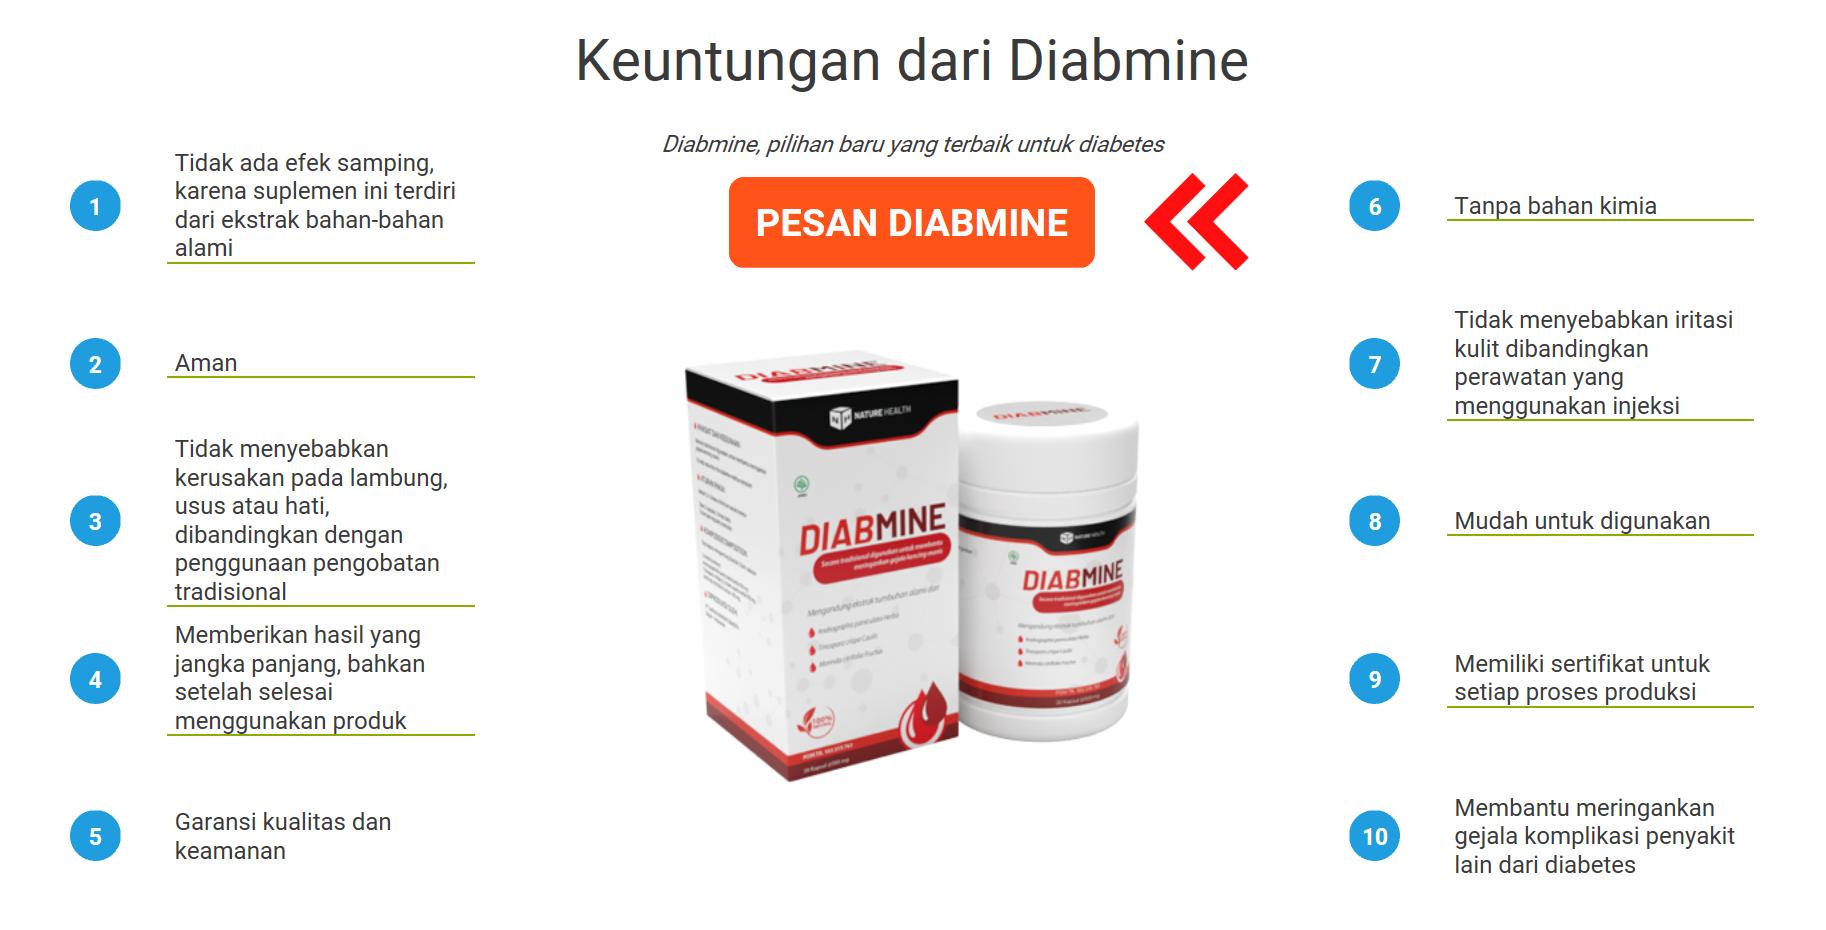 Diabmine